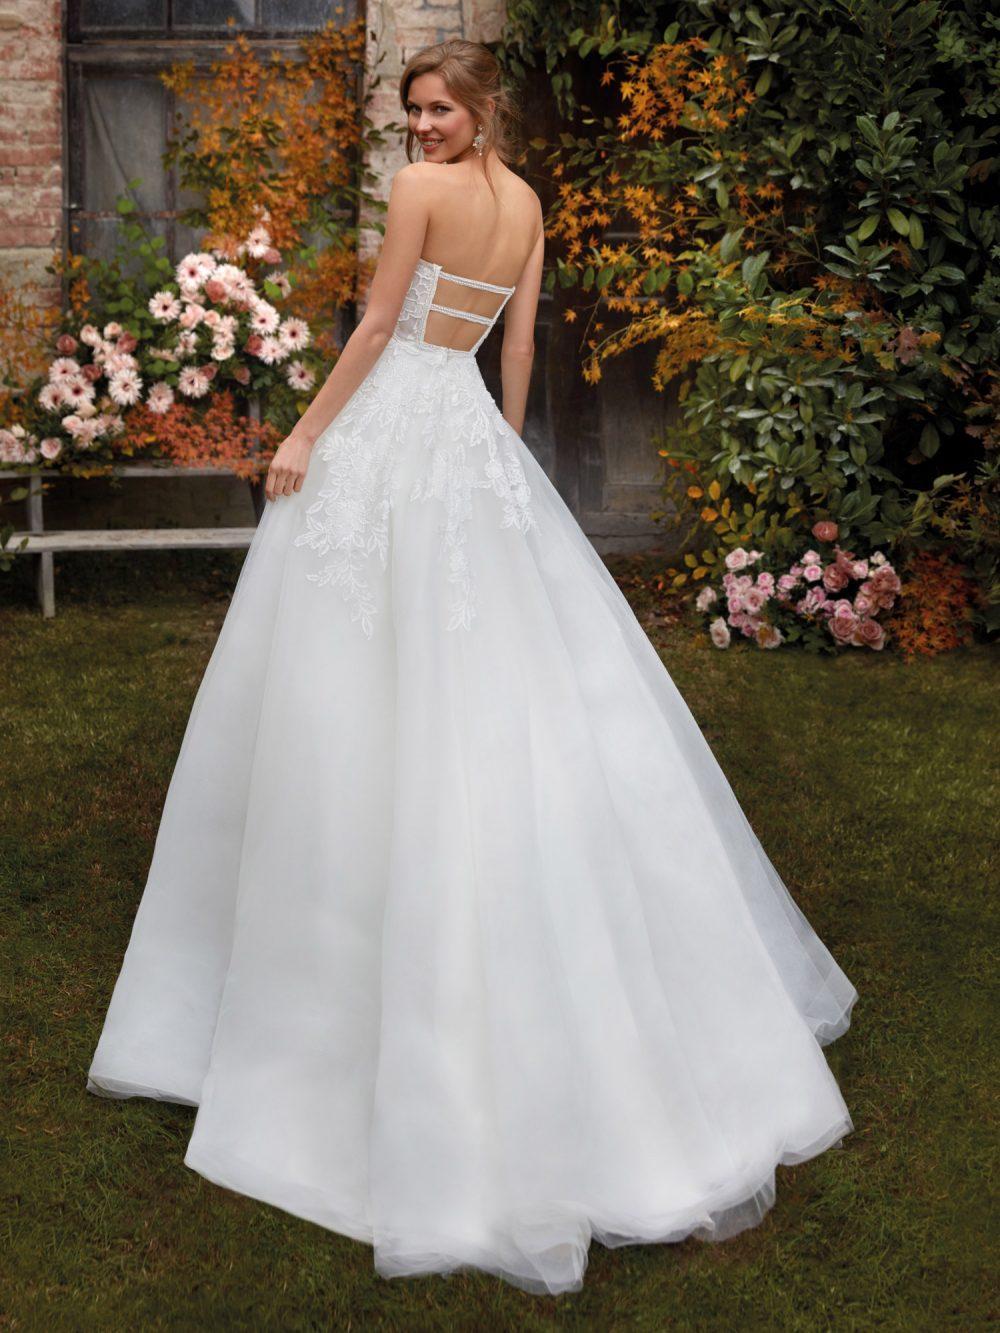 Mariages: abito da sposa Colet 2021 a Vicenza, Verona, Padova, Veneto CO12151